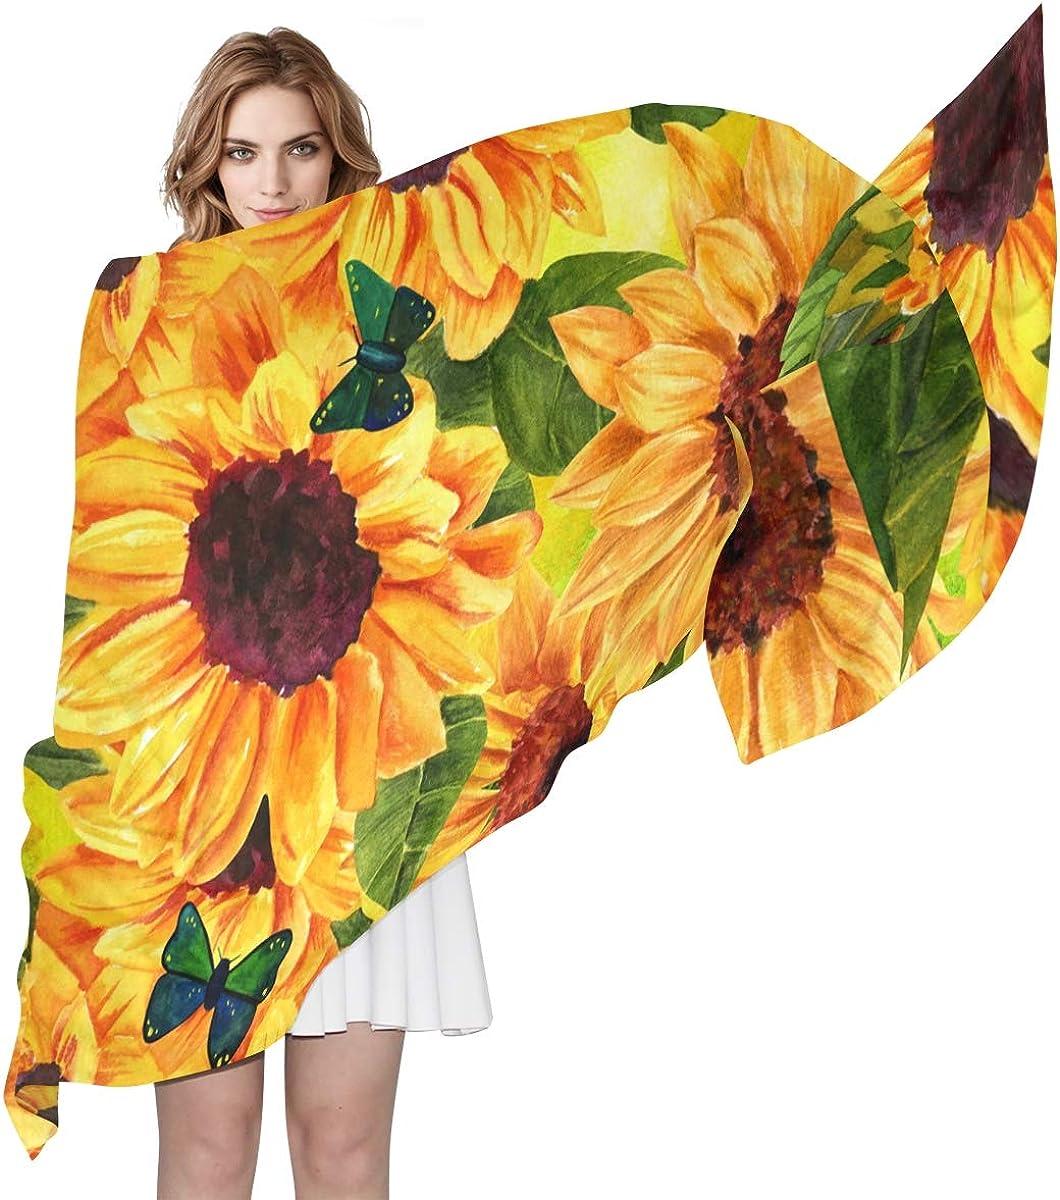 XLING Fashion Scarf Floral Flower Sunflower Butterfly Long Lightweight Sunscreen Scarf Shawl Wrap Muffler Neckerchief for Women Men